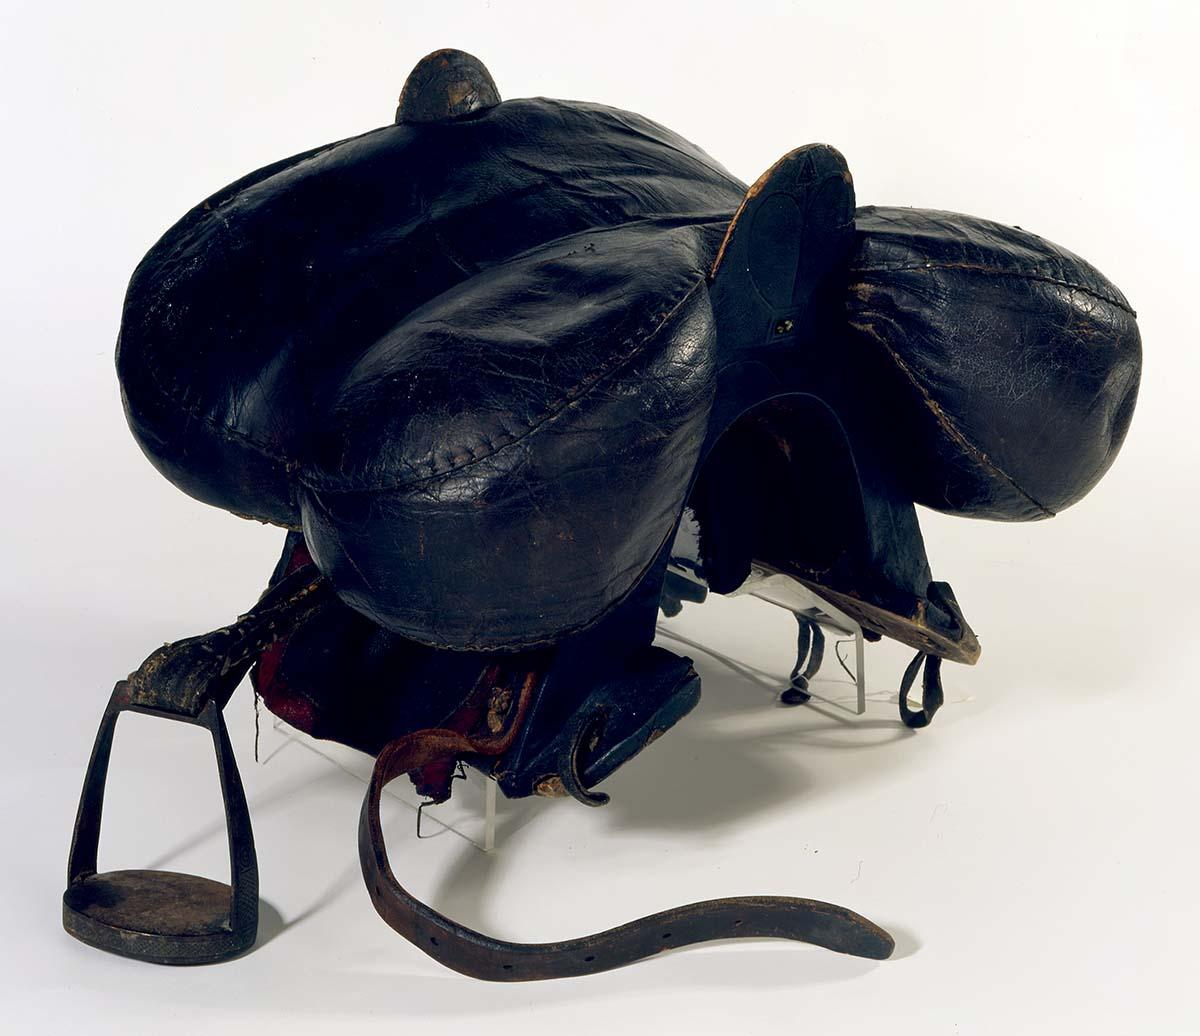 Cossack (Georgian) saddle, ca. 1900. 1.69.2410